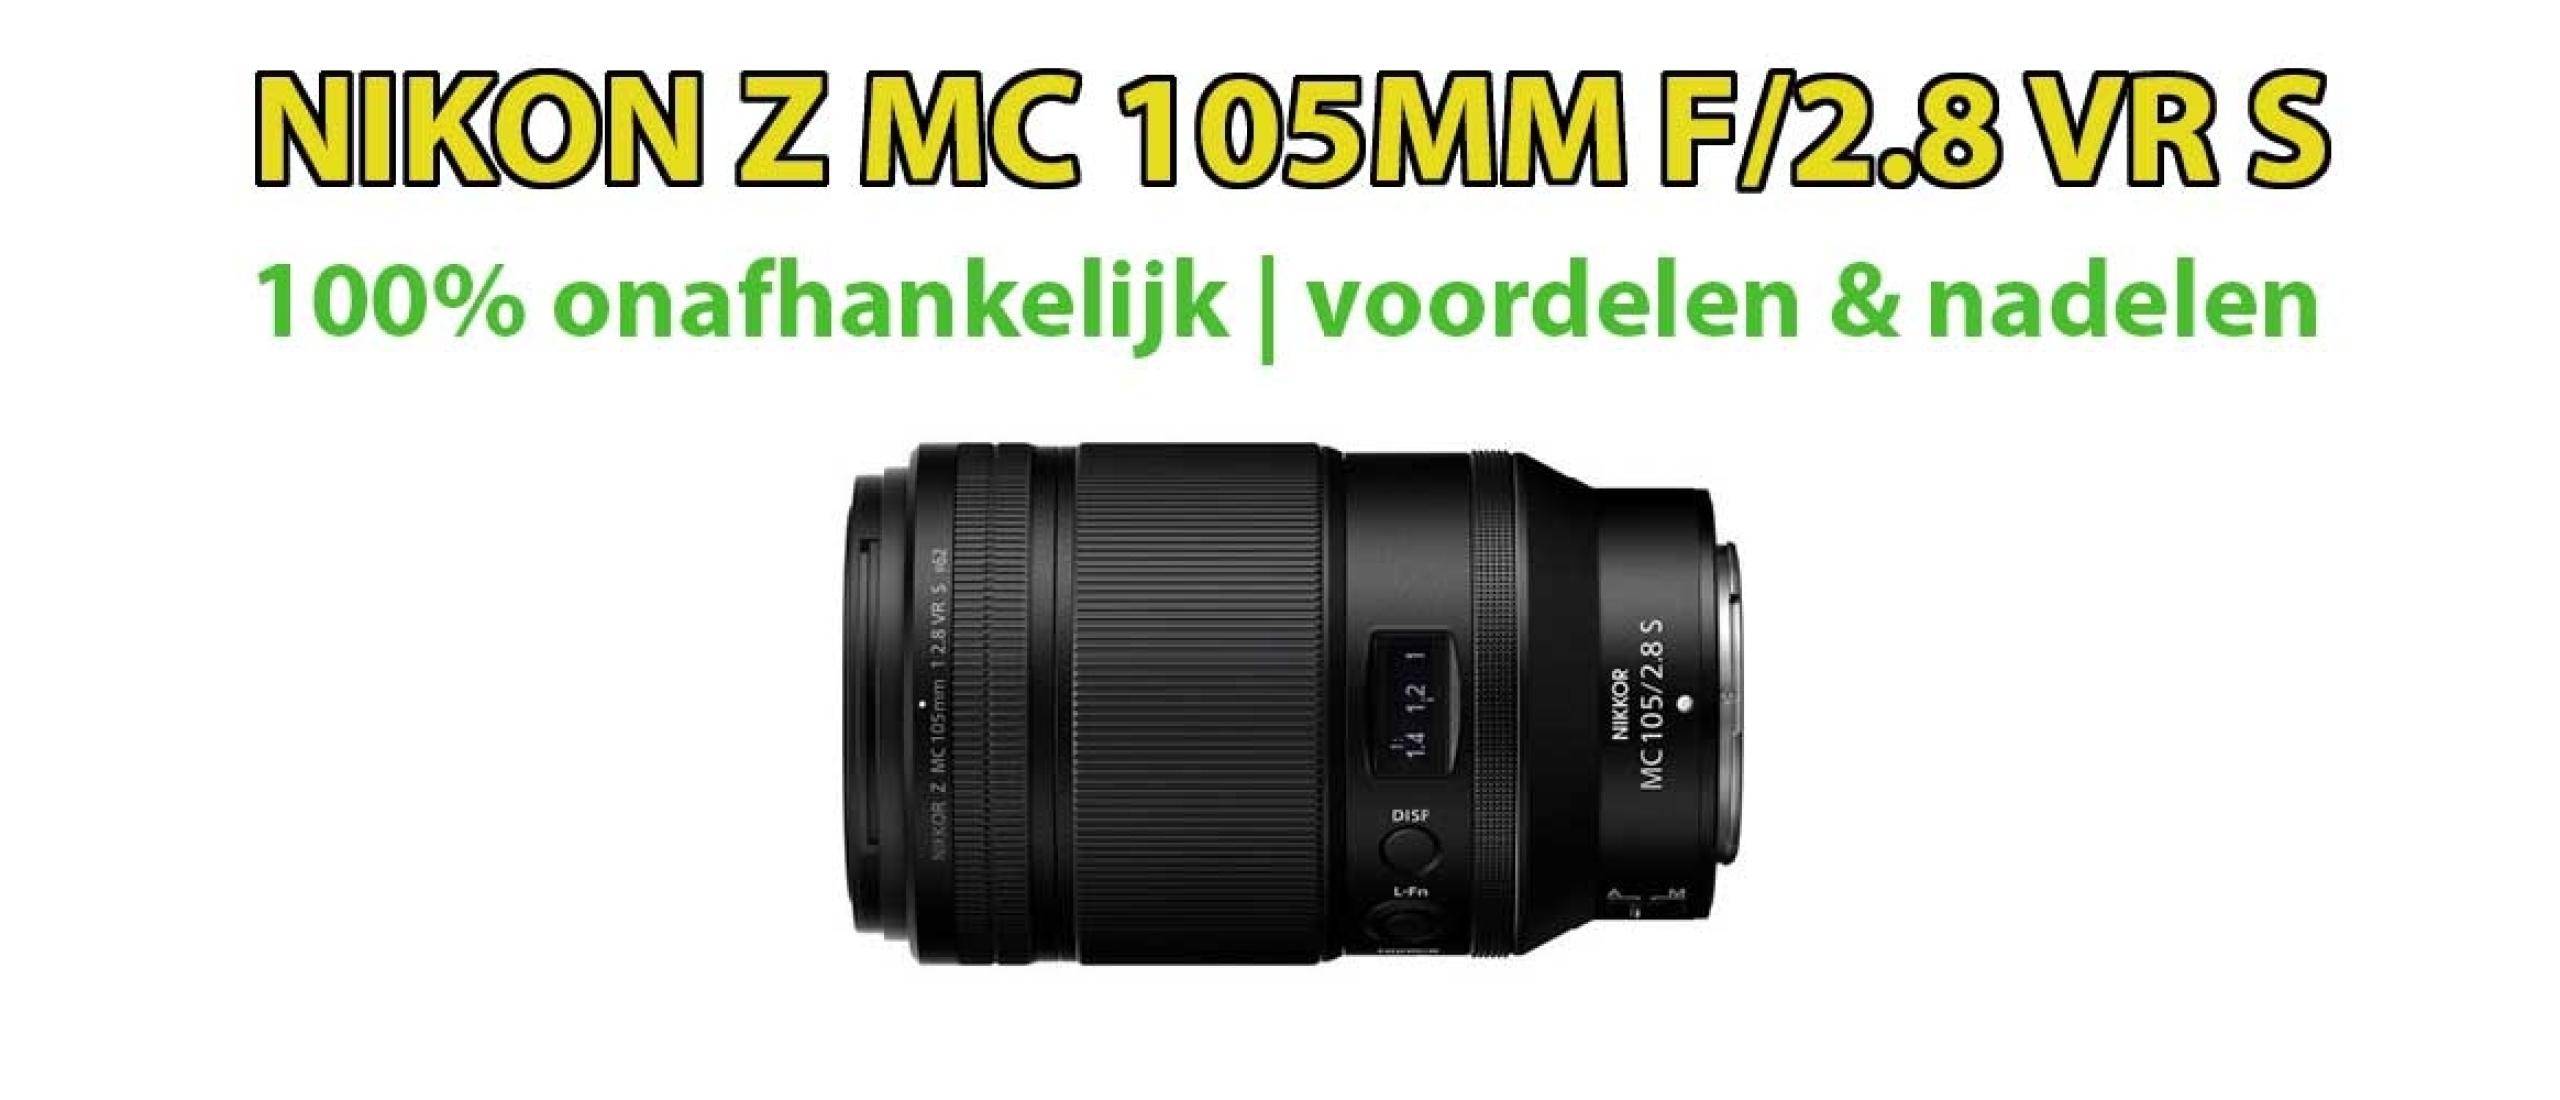 Nikon Z mc 105mm f/2.8 VR S macro lens review